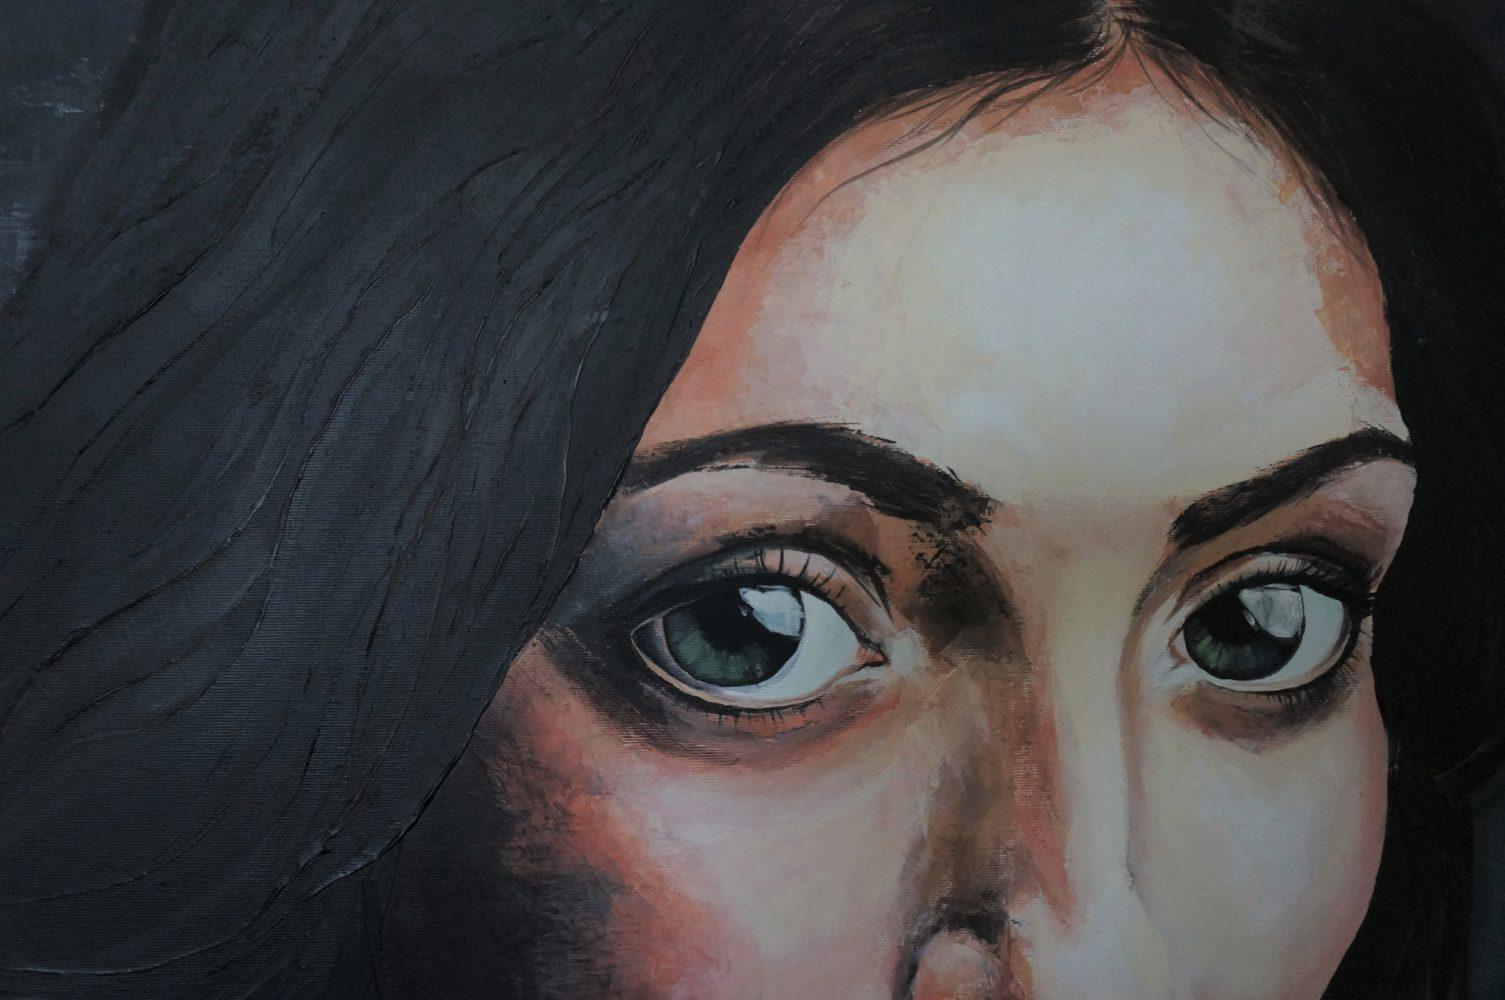 eyes-to-eyes-3